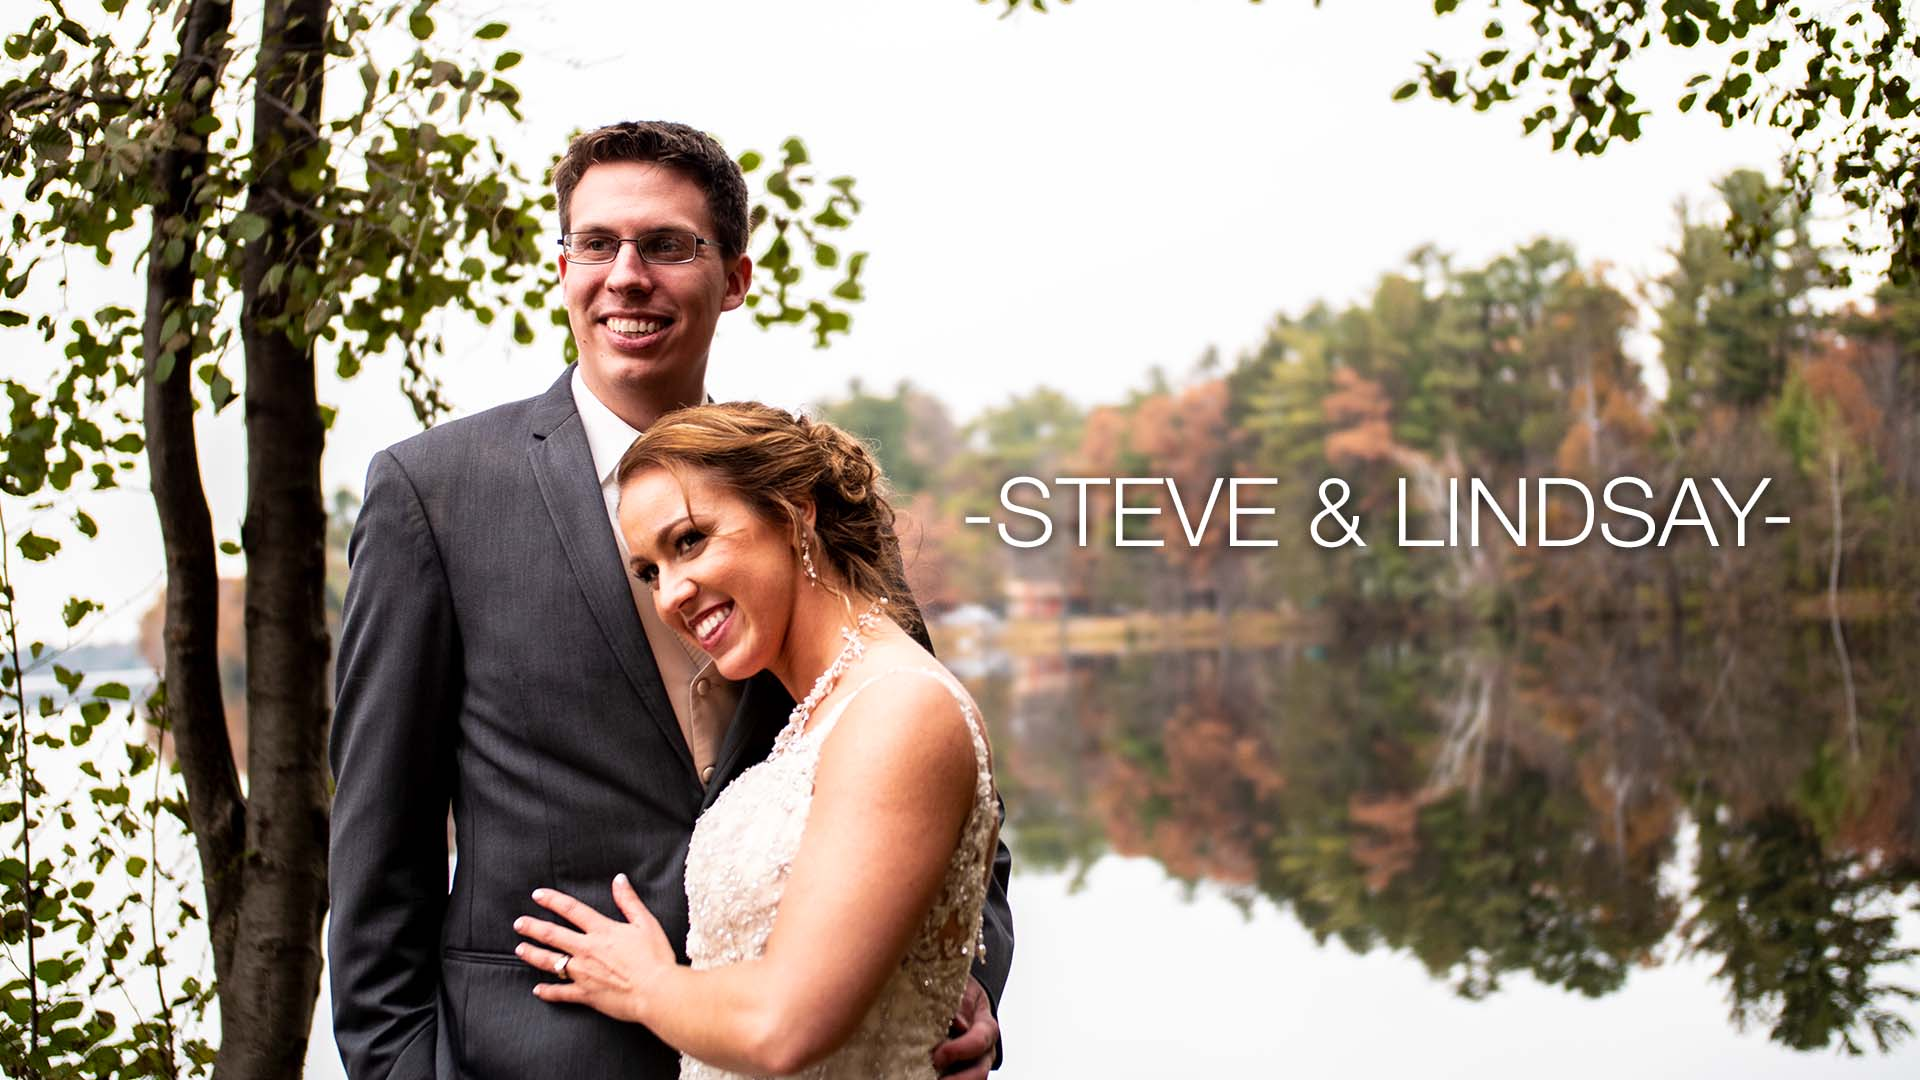 Lindsay + Steve | Rothschild, Wisconsin | Rothschild Pavilion